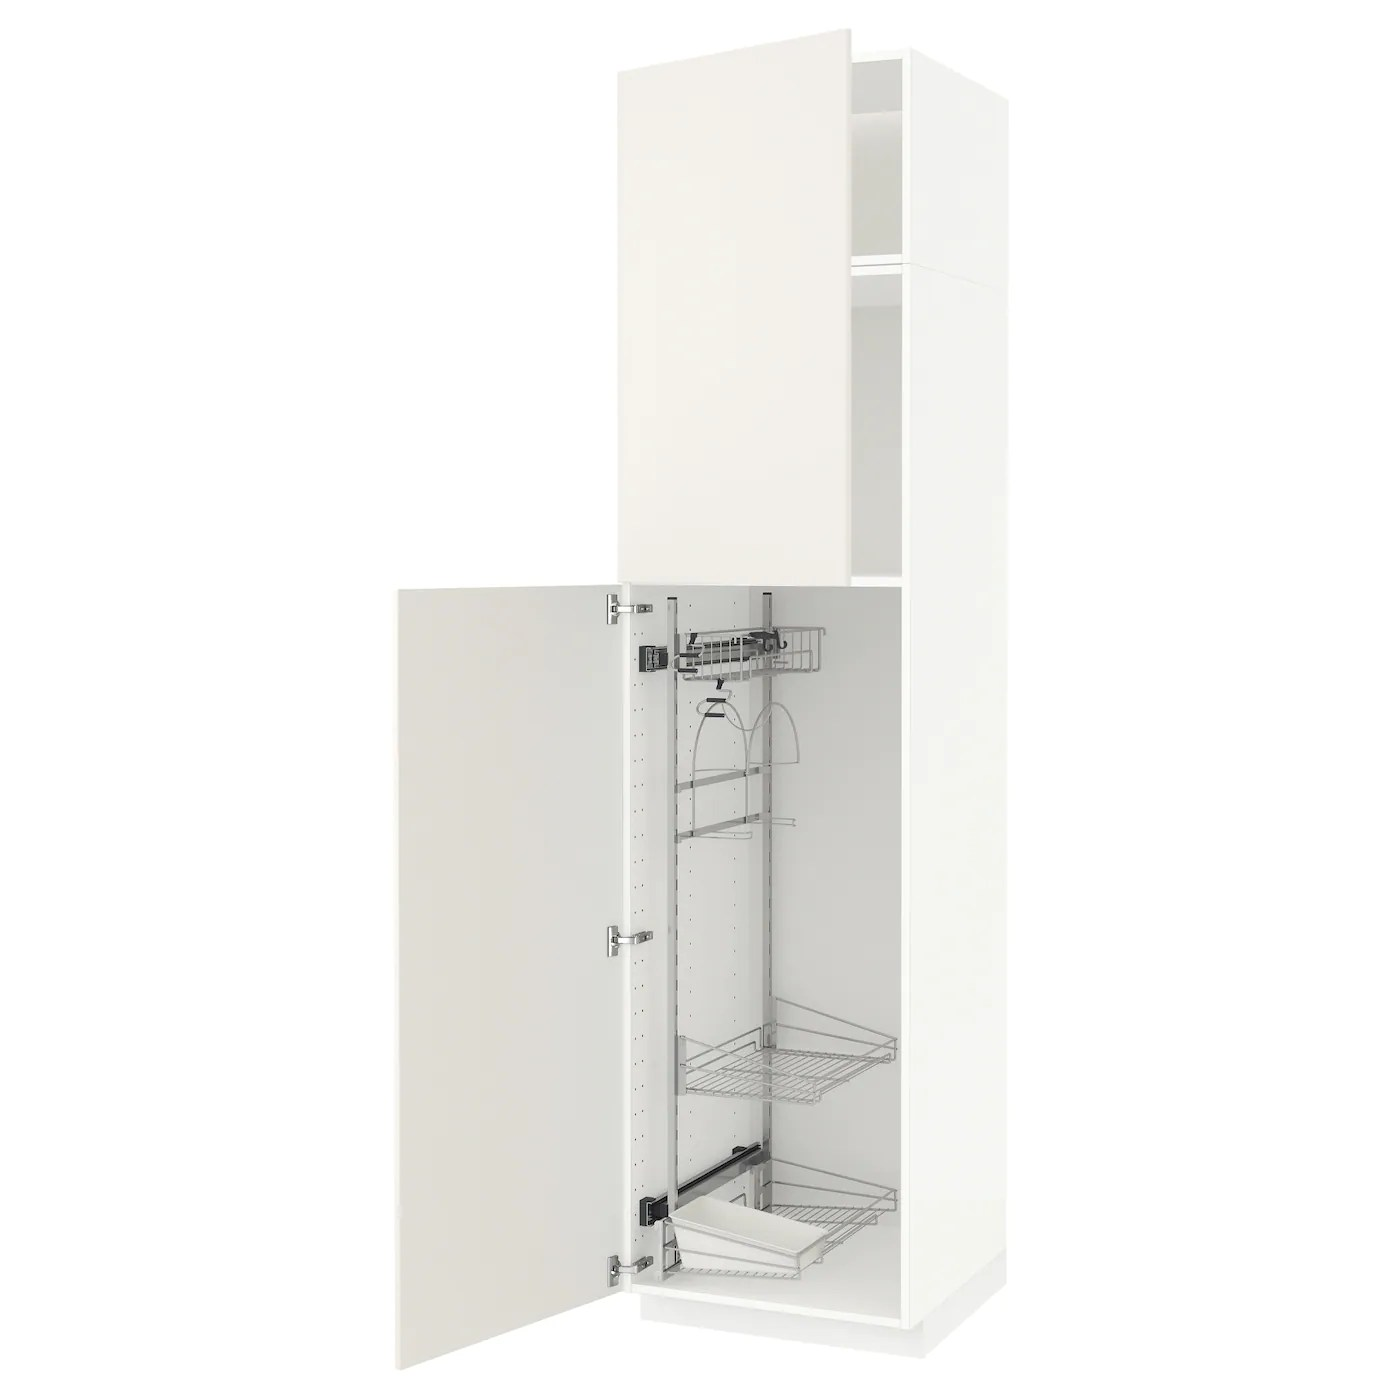 Metod Elt Haut Et Rangt Prod Entr Blanc Veddinge Blanc 60x60x240 Cm Ikea